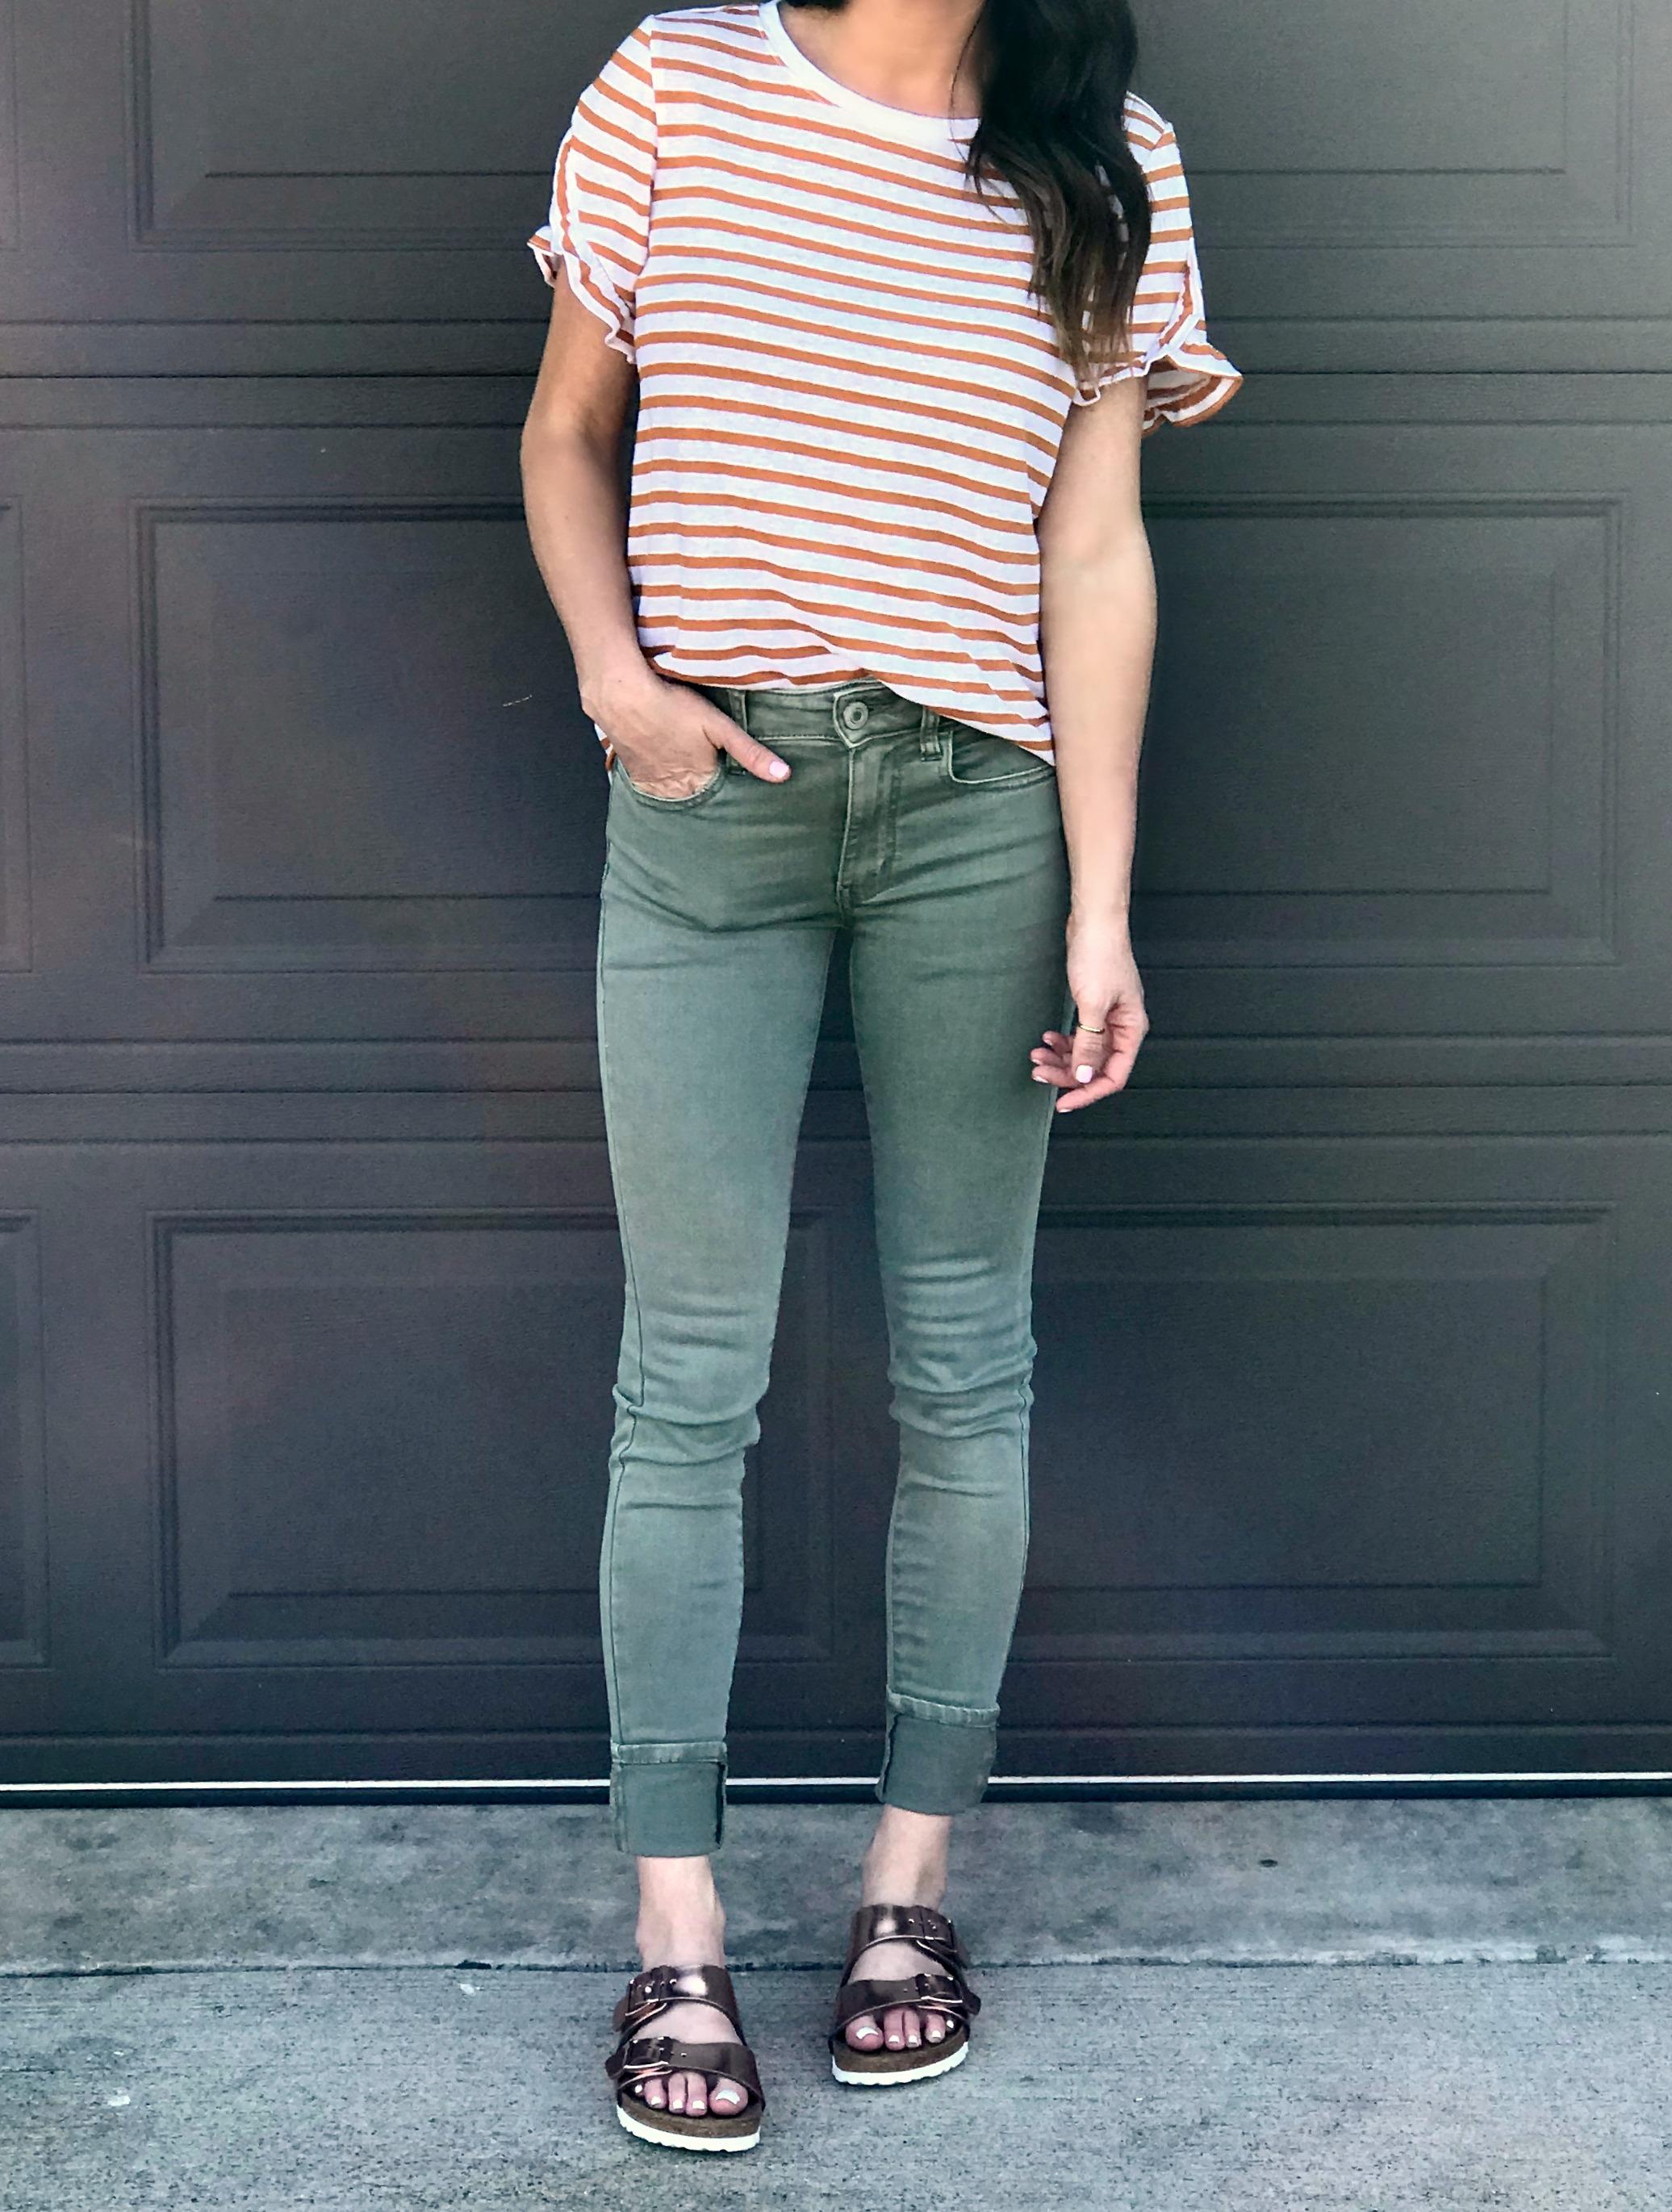 Green Pants, striped top, gold birkenstocks